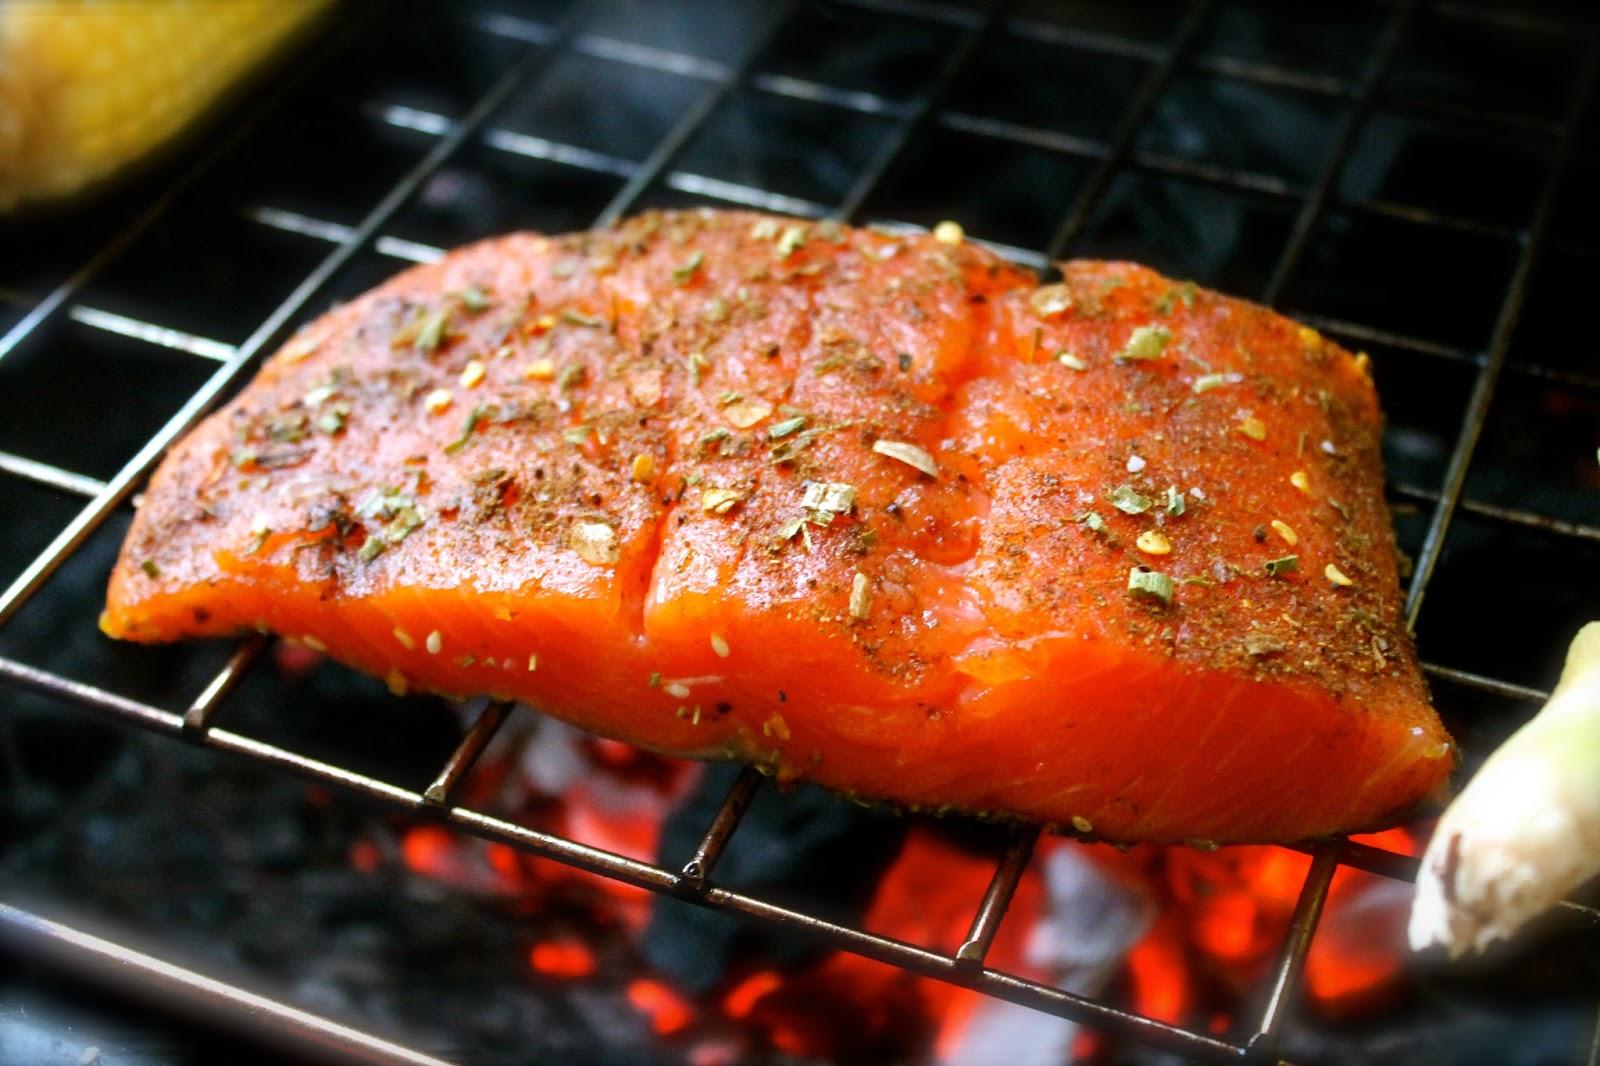 Slasno i ukusno: Losos sa grilla